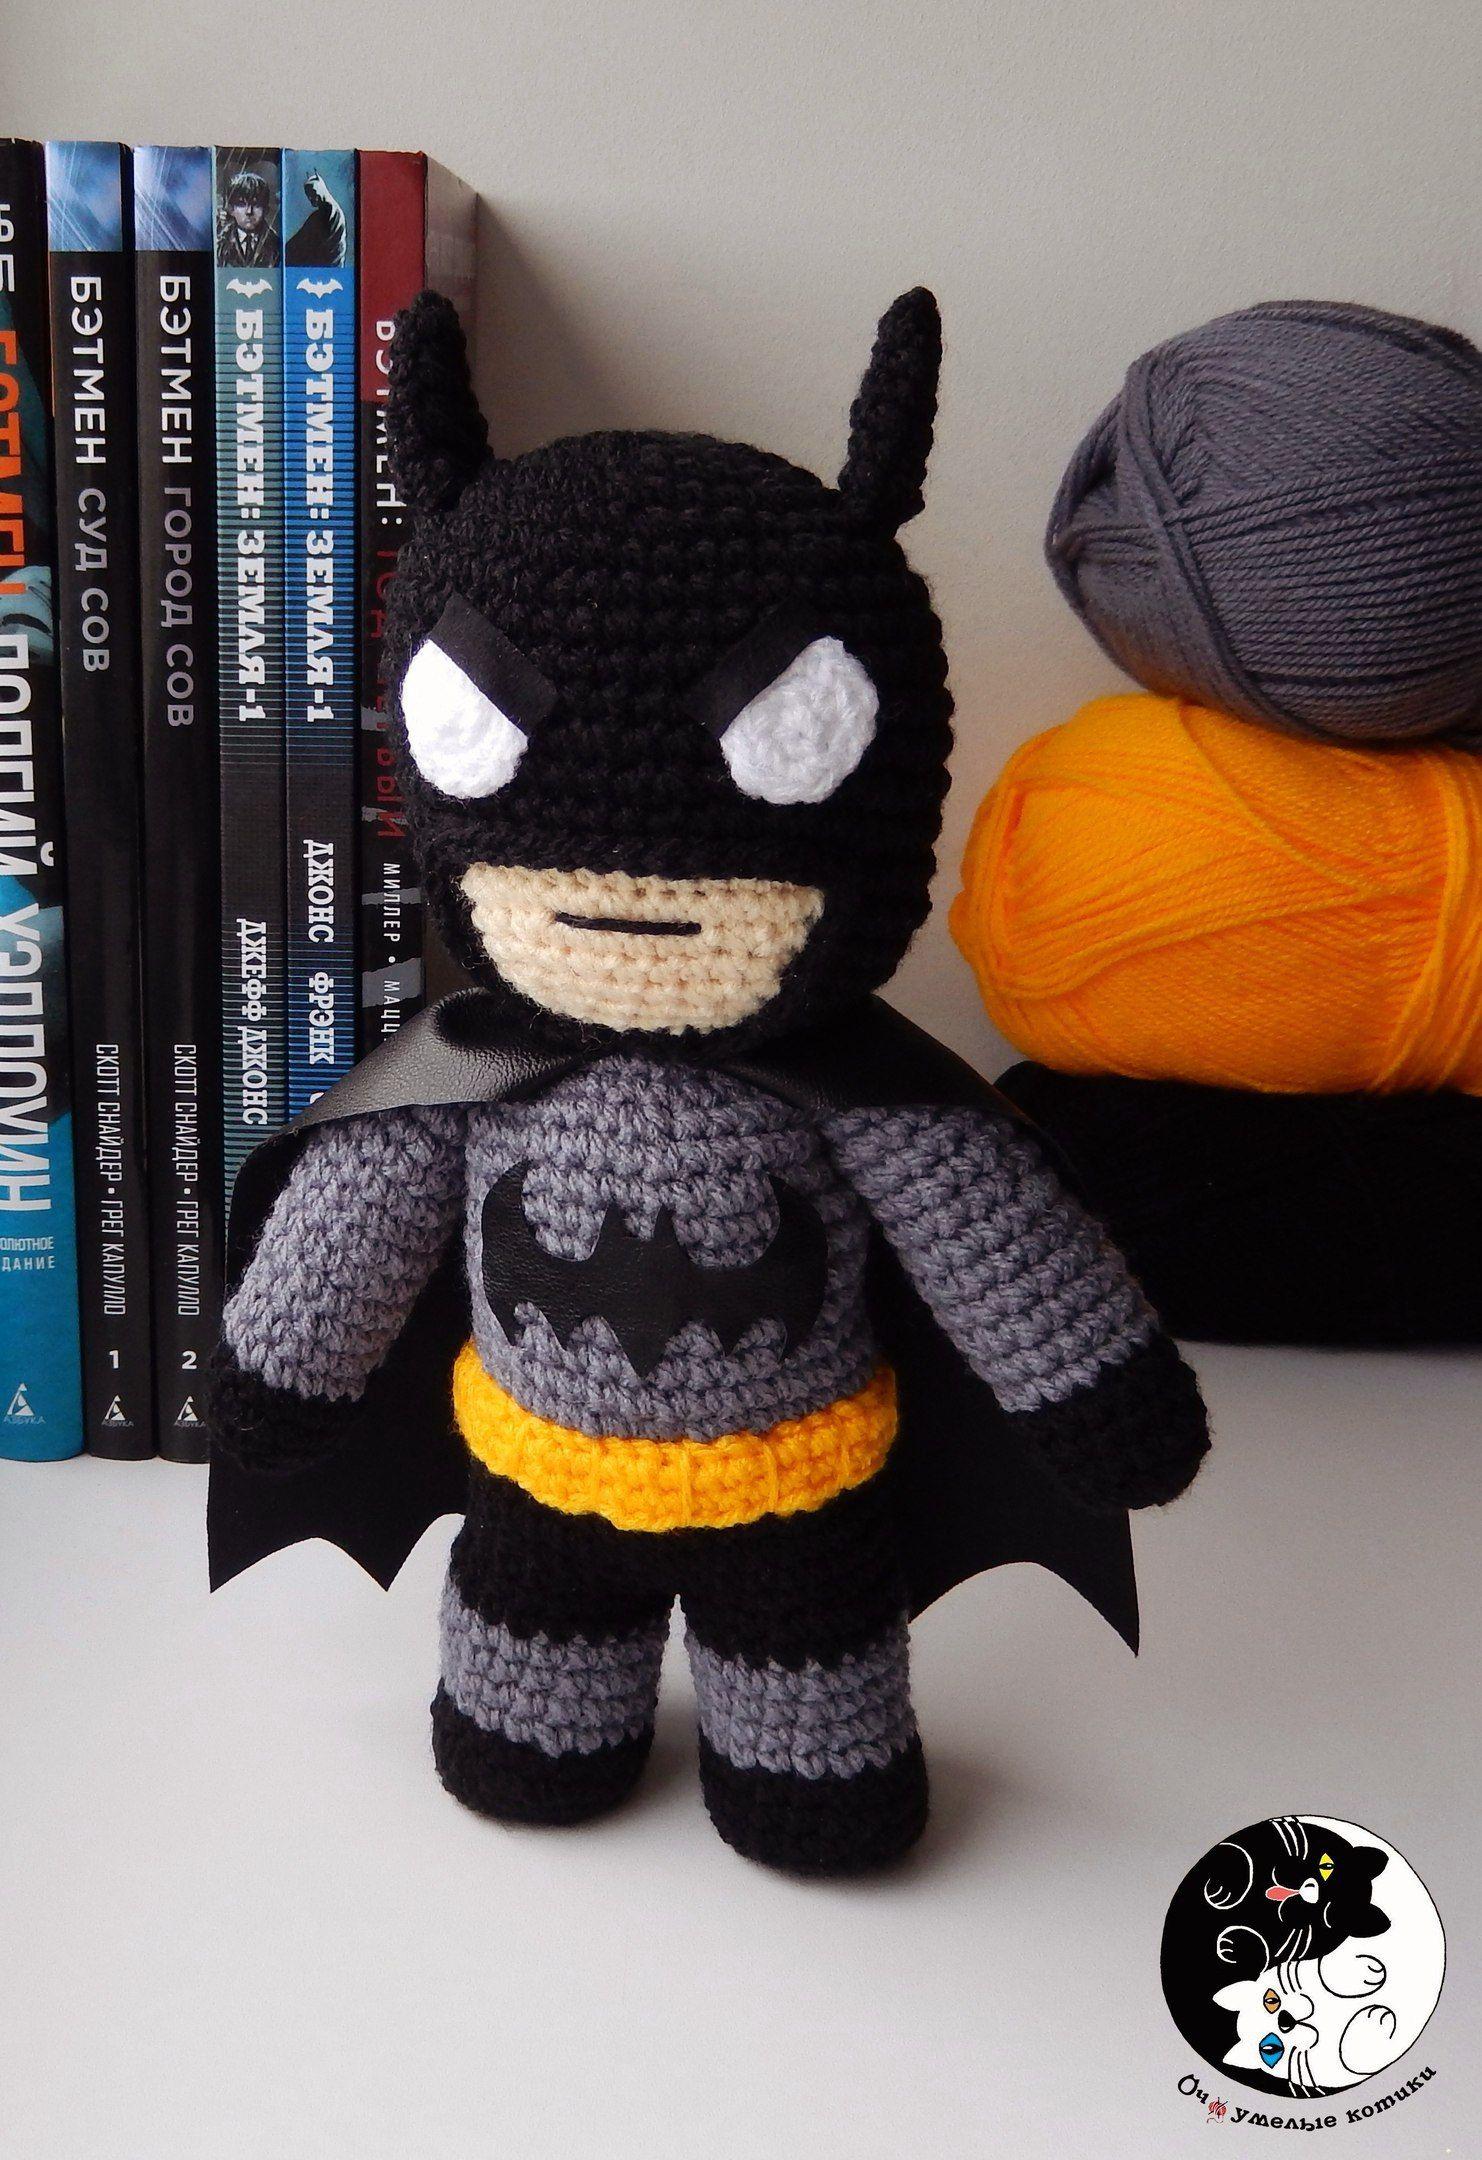 Batman Amigurumi - Crochet Doll - DC Comics - Knitted Superhero ...